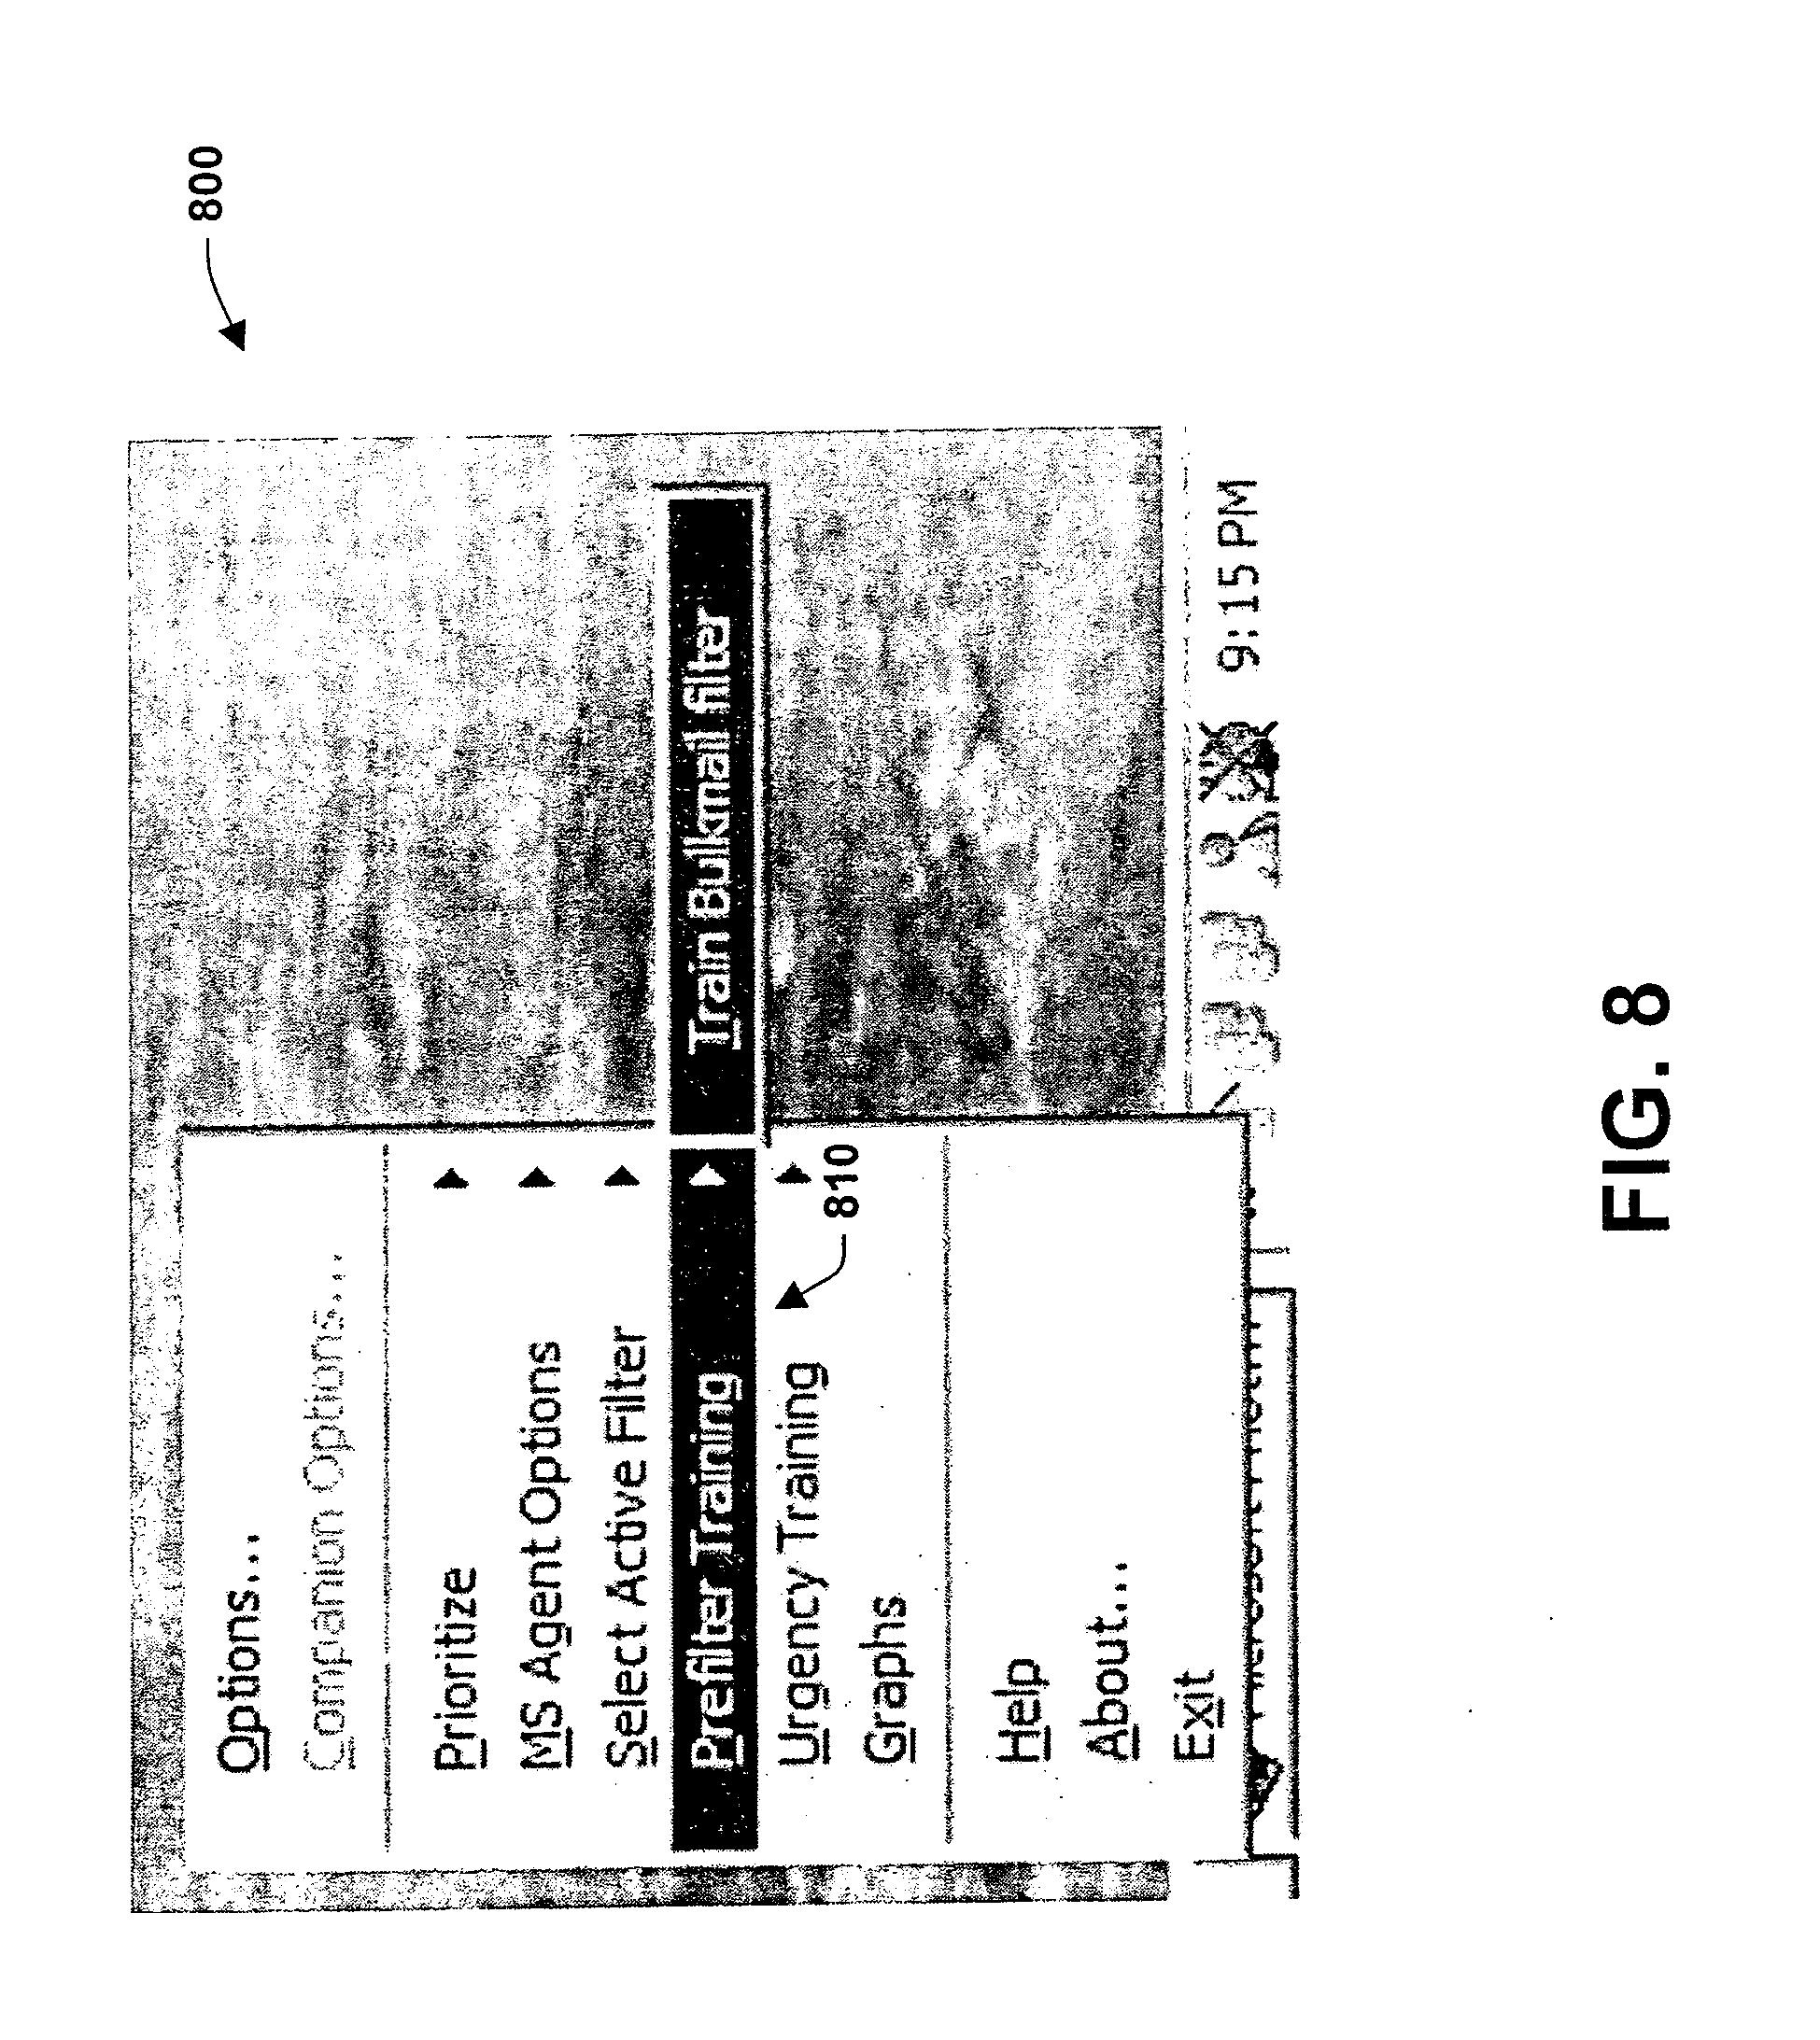 patent ep1494409b1